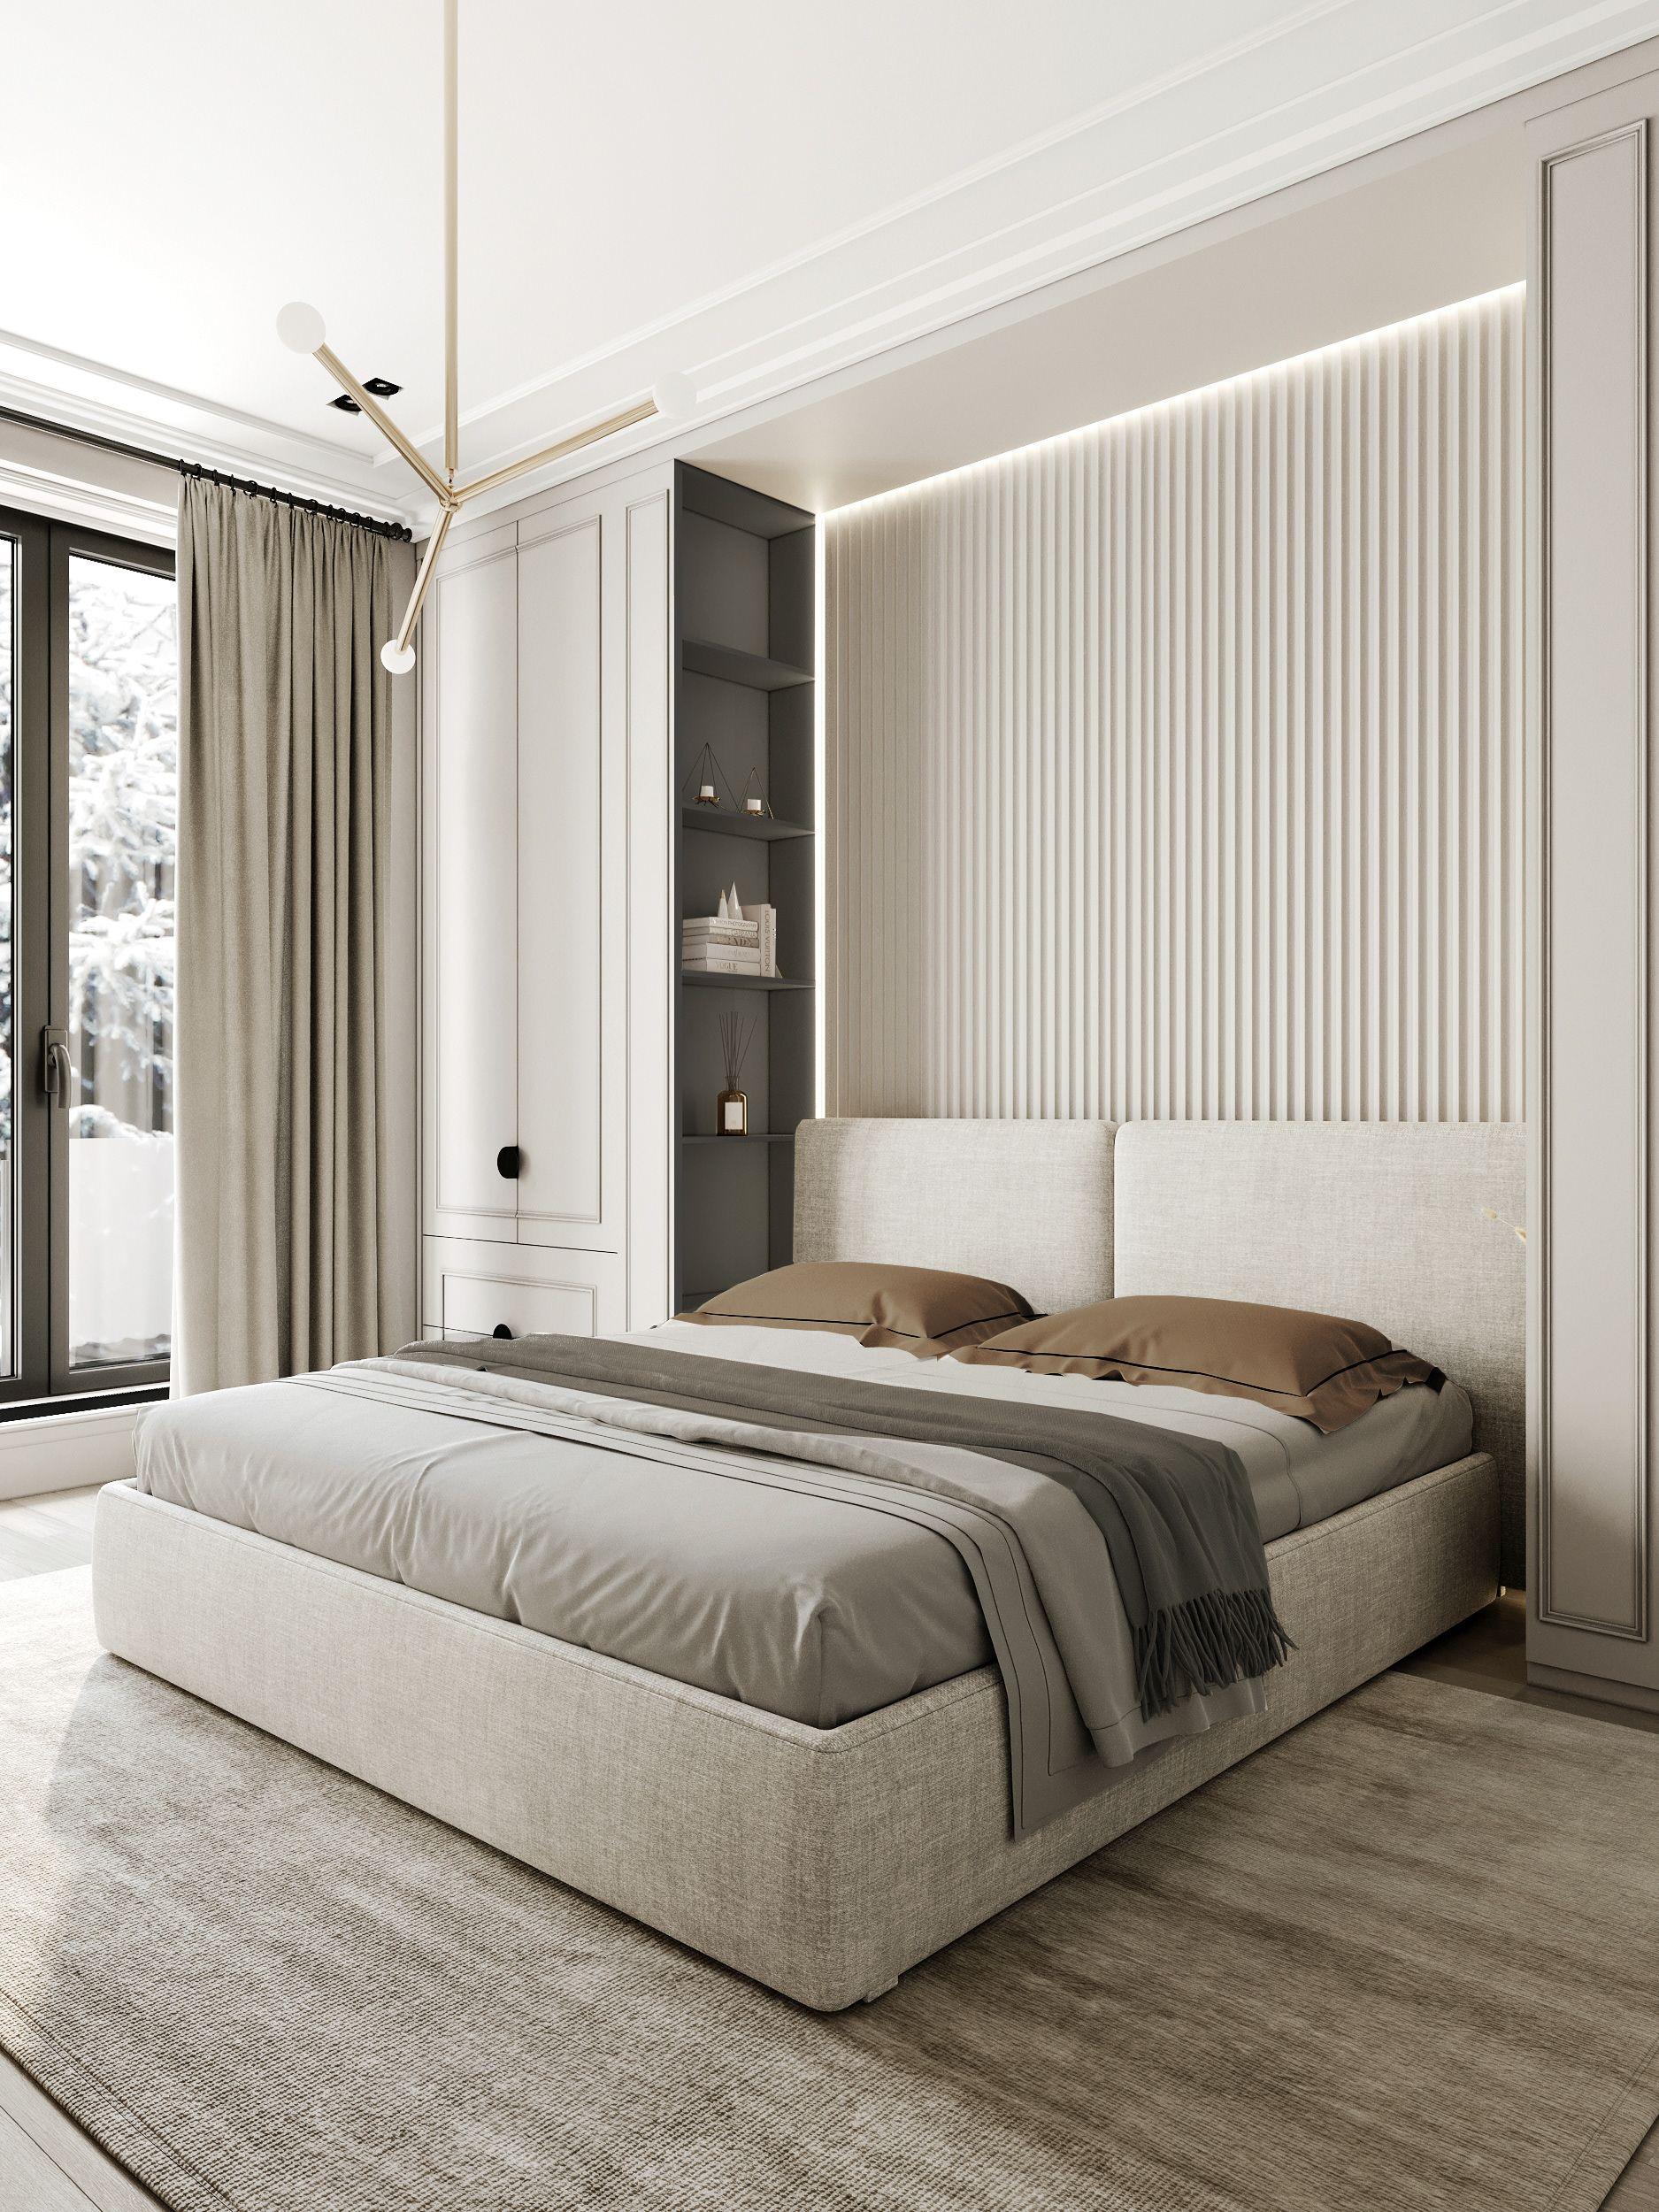 Park Avenue on Behance in 10  Modern luxury bedroom, Apartment